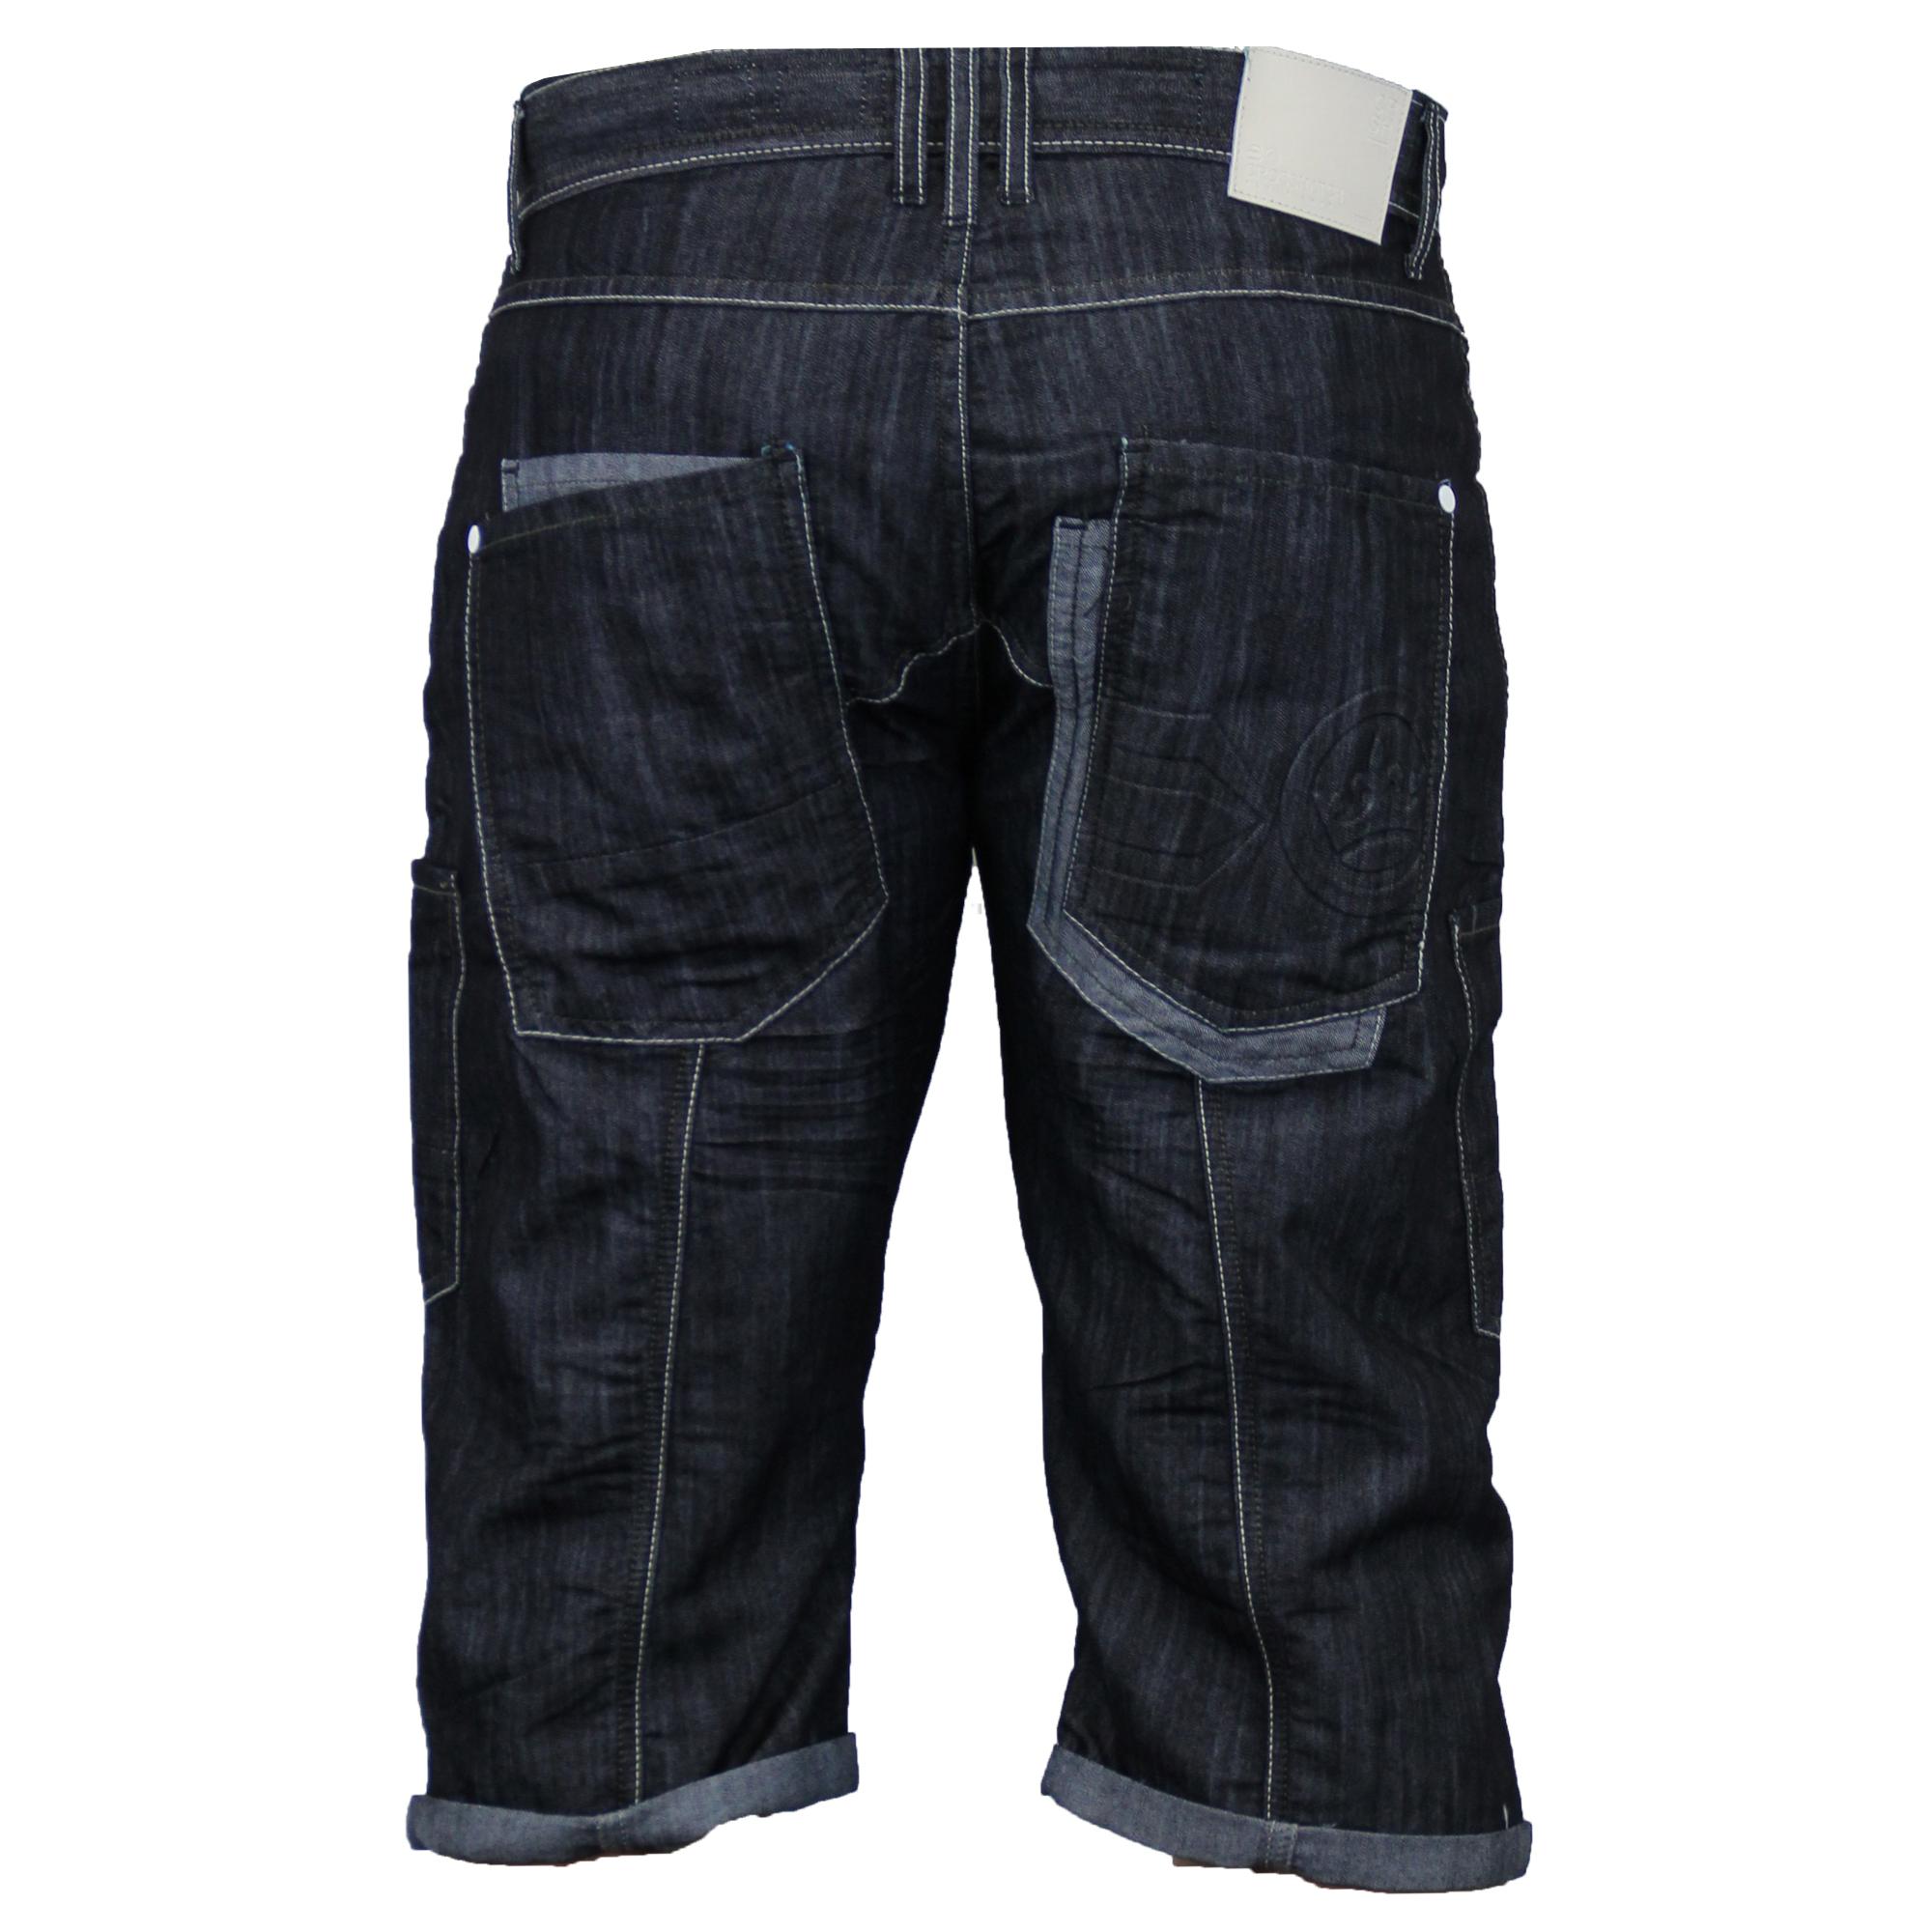 Mens-Crosshatch-Denim-Knee-Length-Combat-Shorts-Cargo-Casual-Fashion-Summer-New 縮圖 26